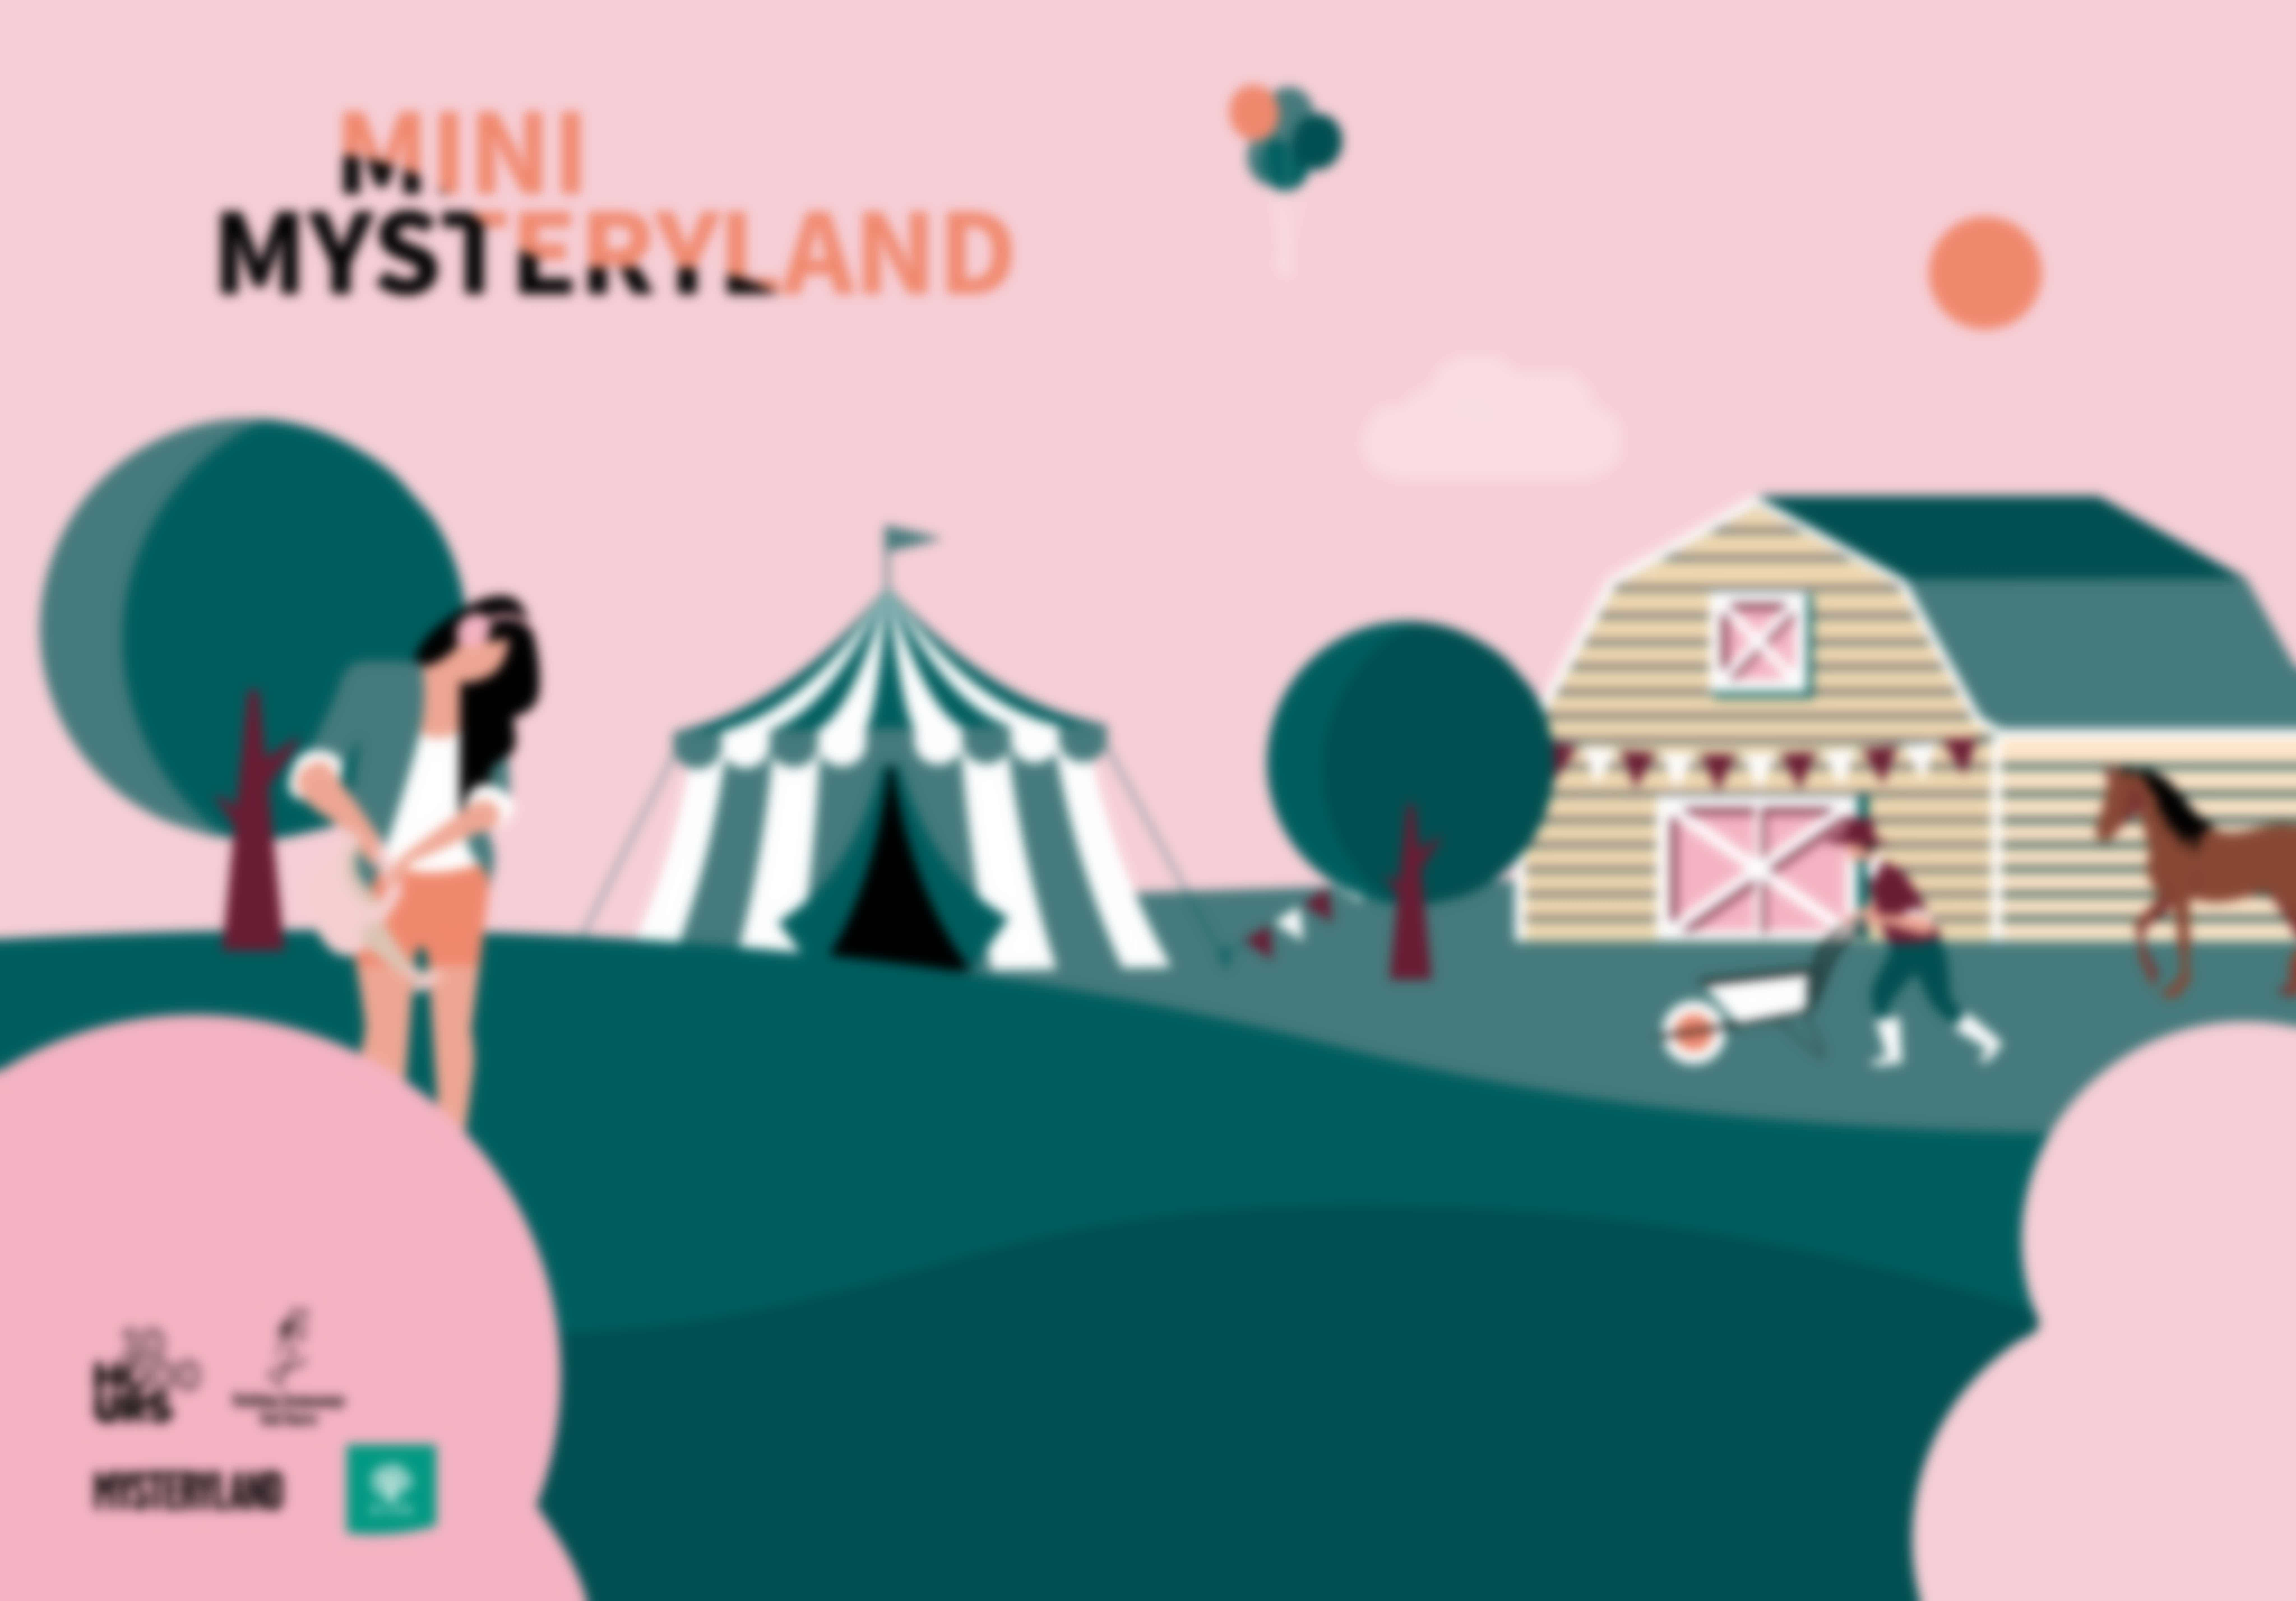 Mini Mysteryland